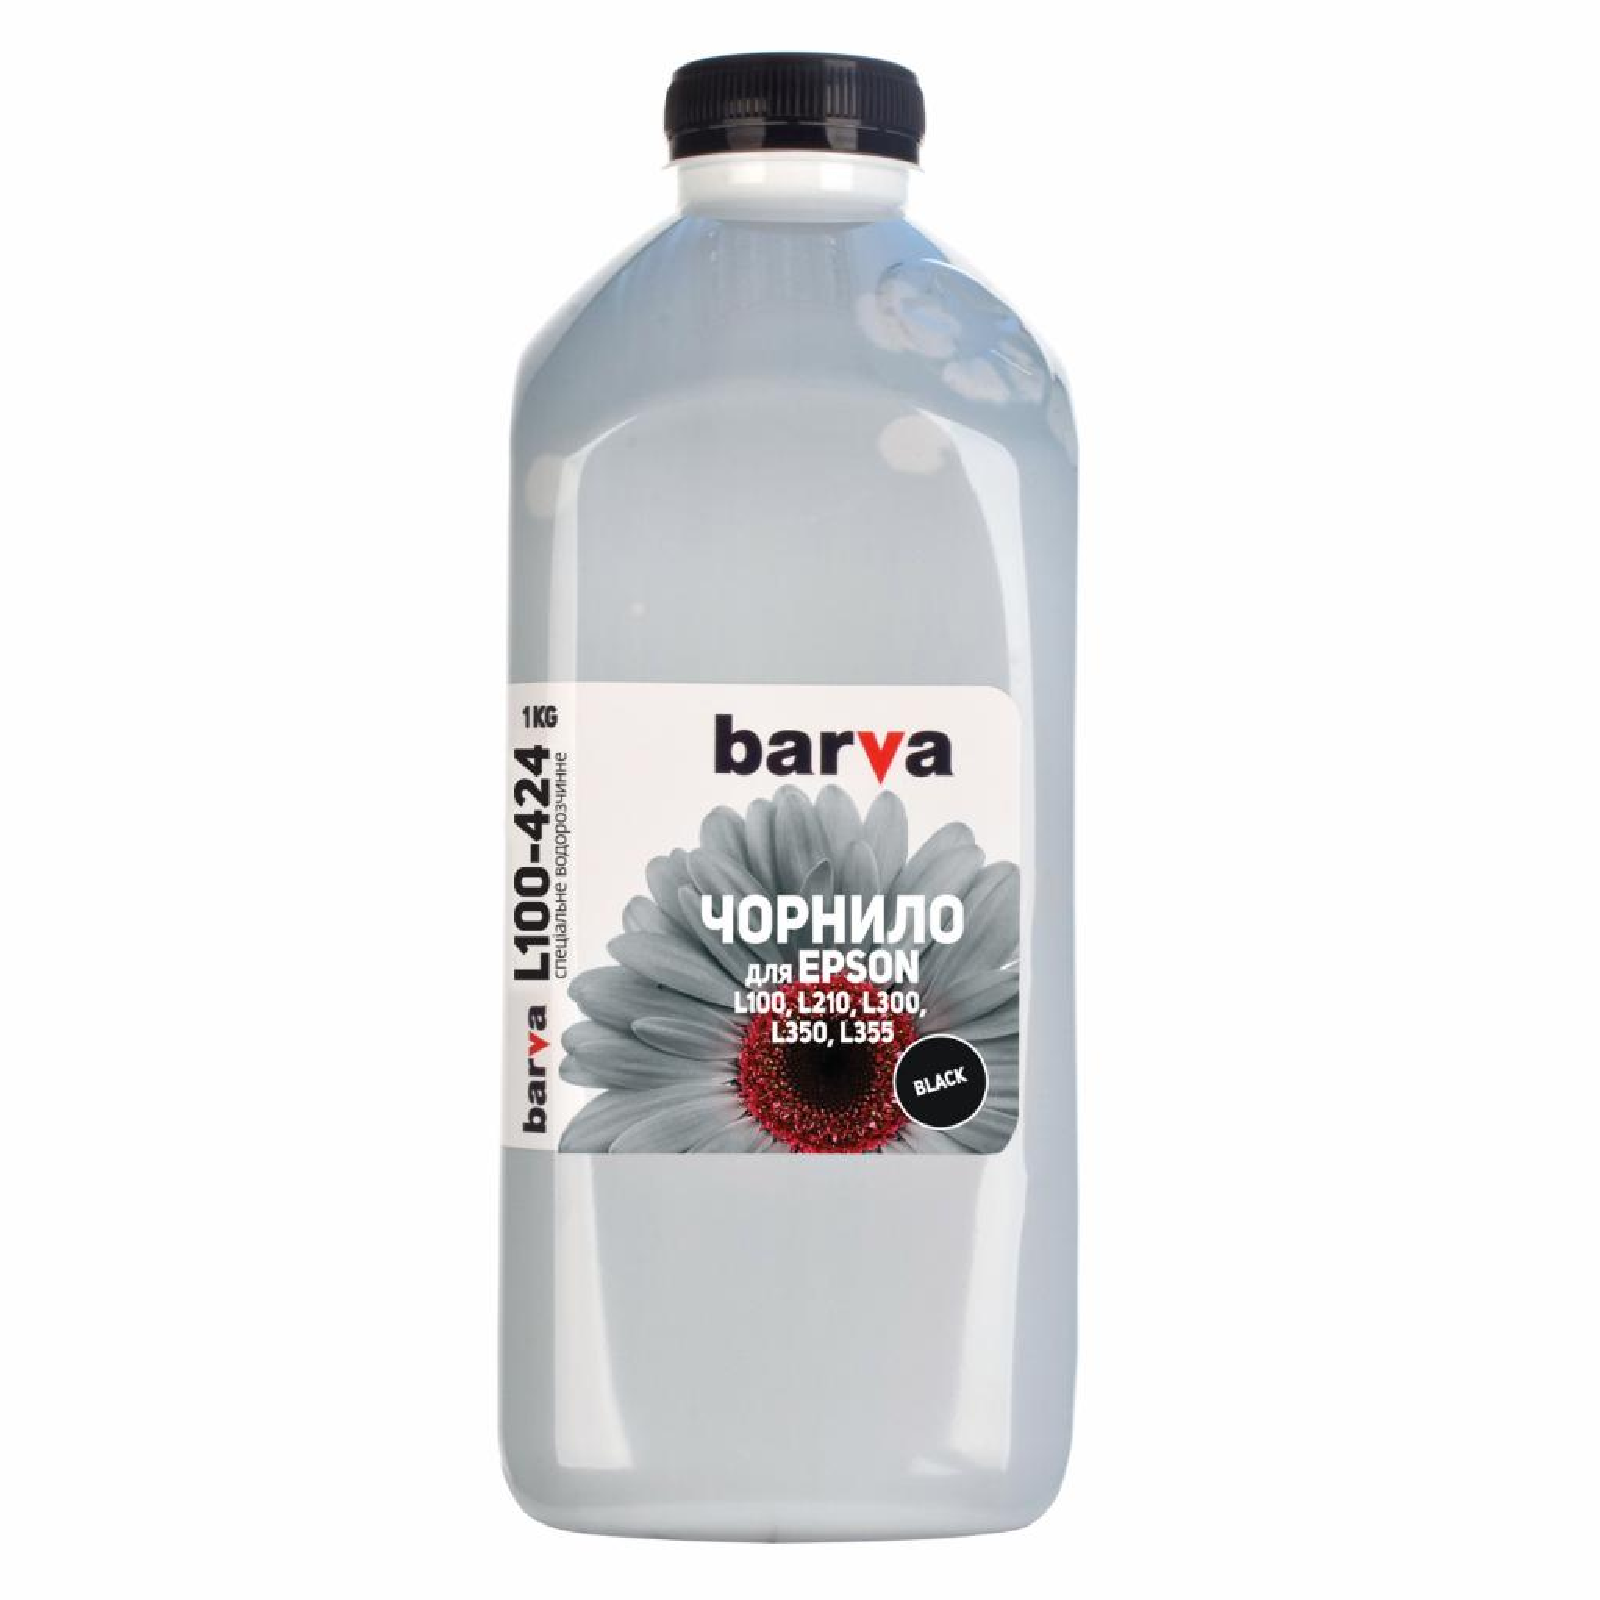 Чернила BARVA EPSON L100/L210/L300/L350/L355 (T6641) 1кг BLACK (L100-424)